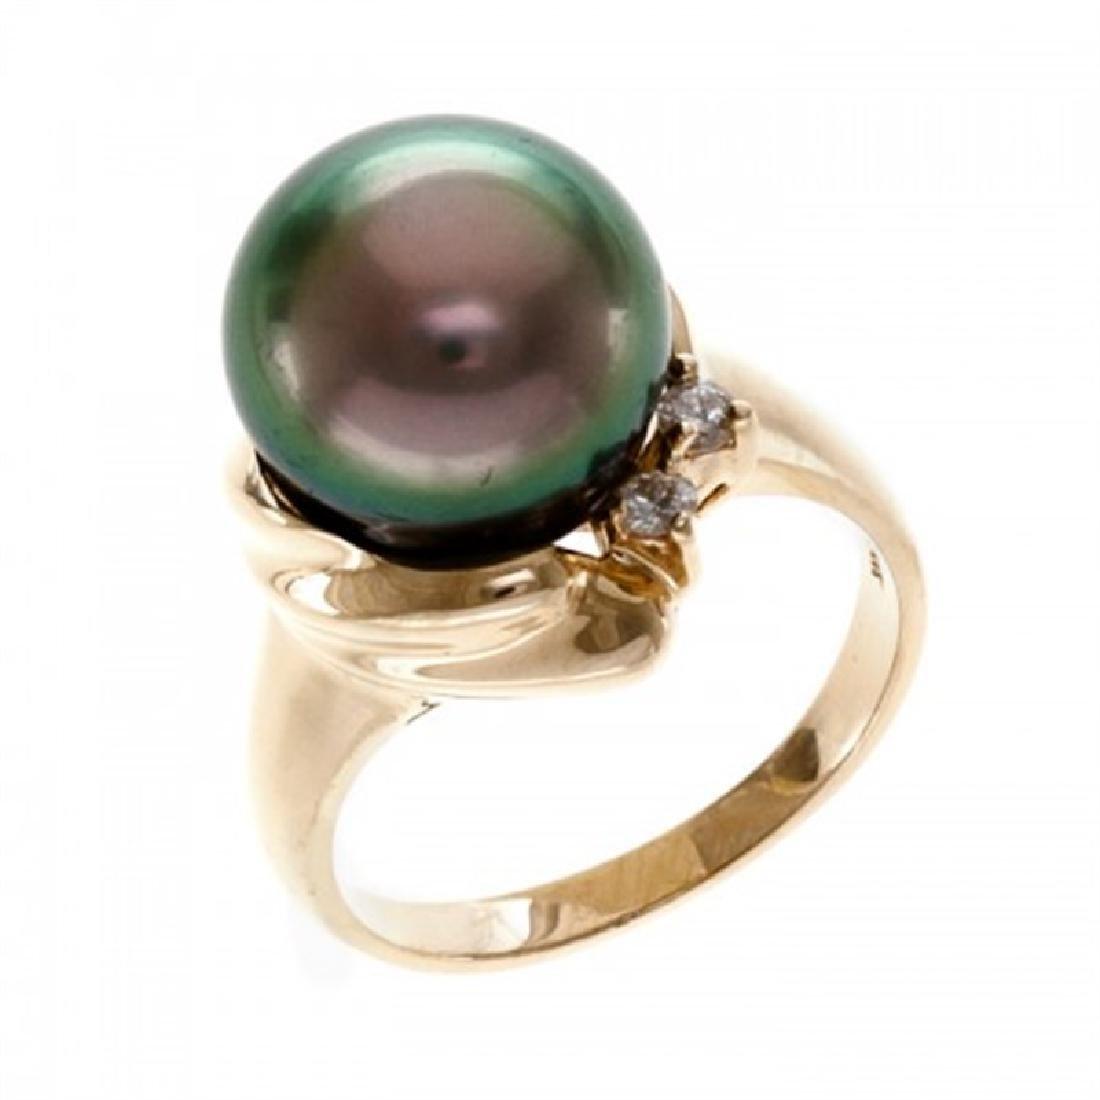 11.5-12.0mm Tahitian Black Pearl Ring with Diamond